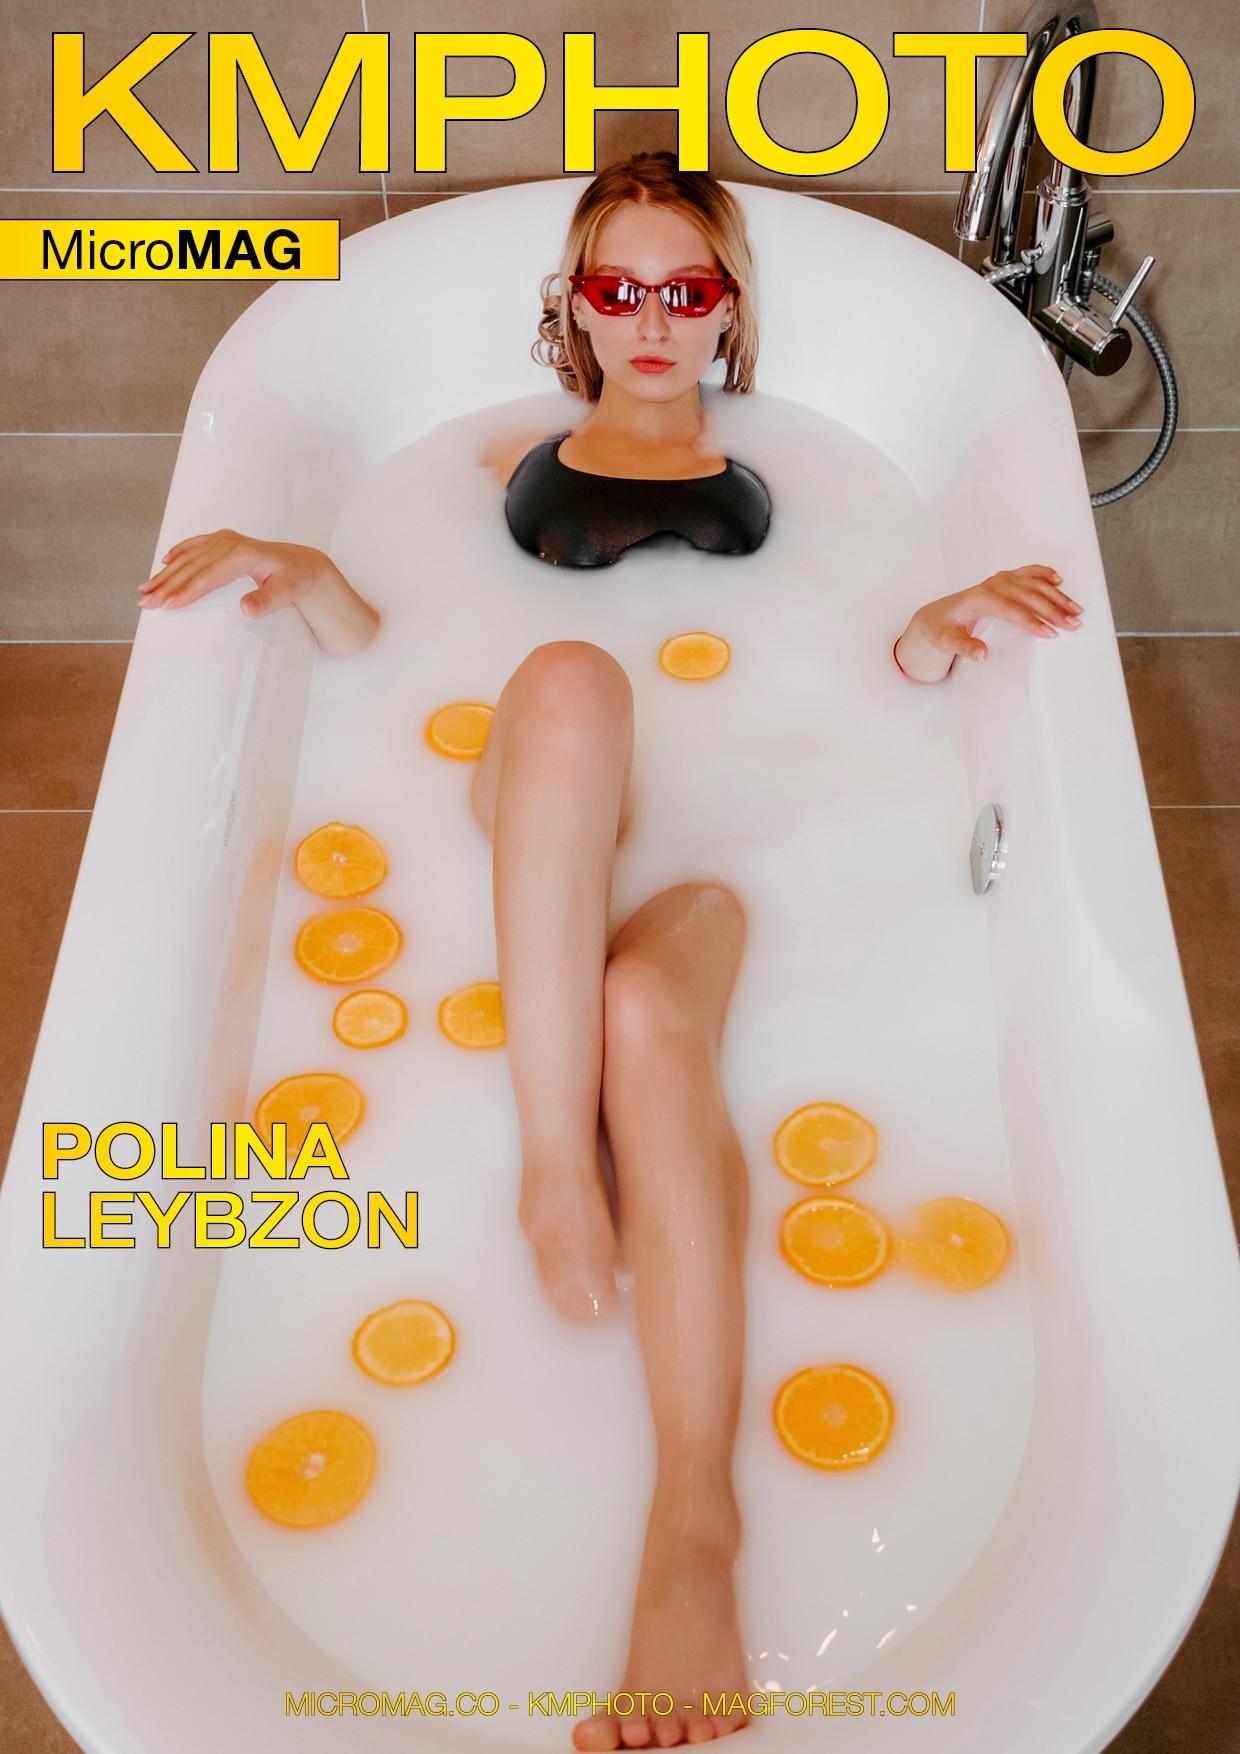 KMphoto MicroMAG - Polina Leybzon - Issue 3